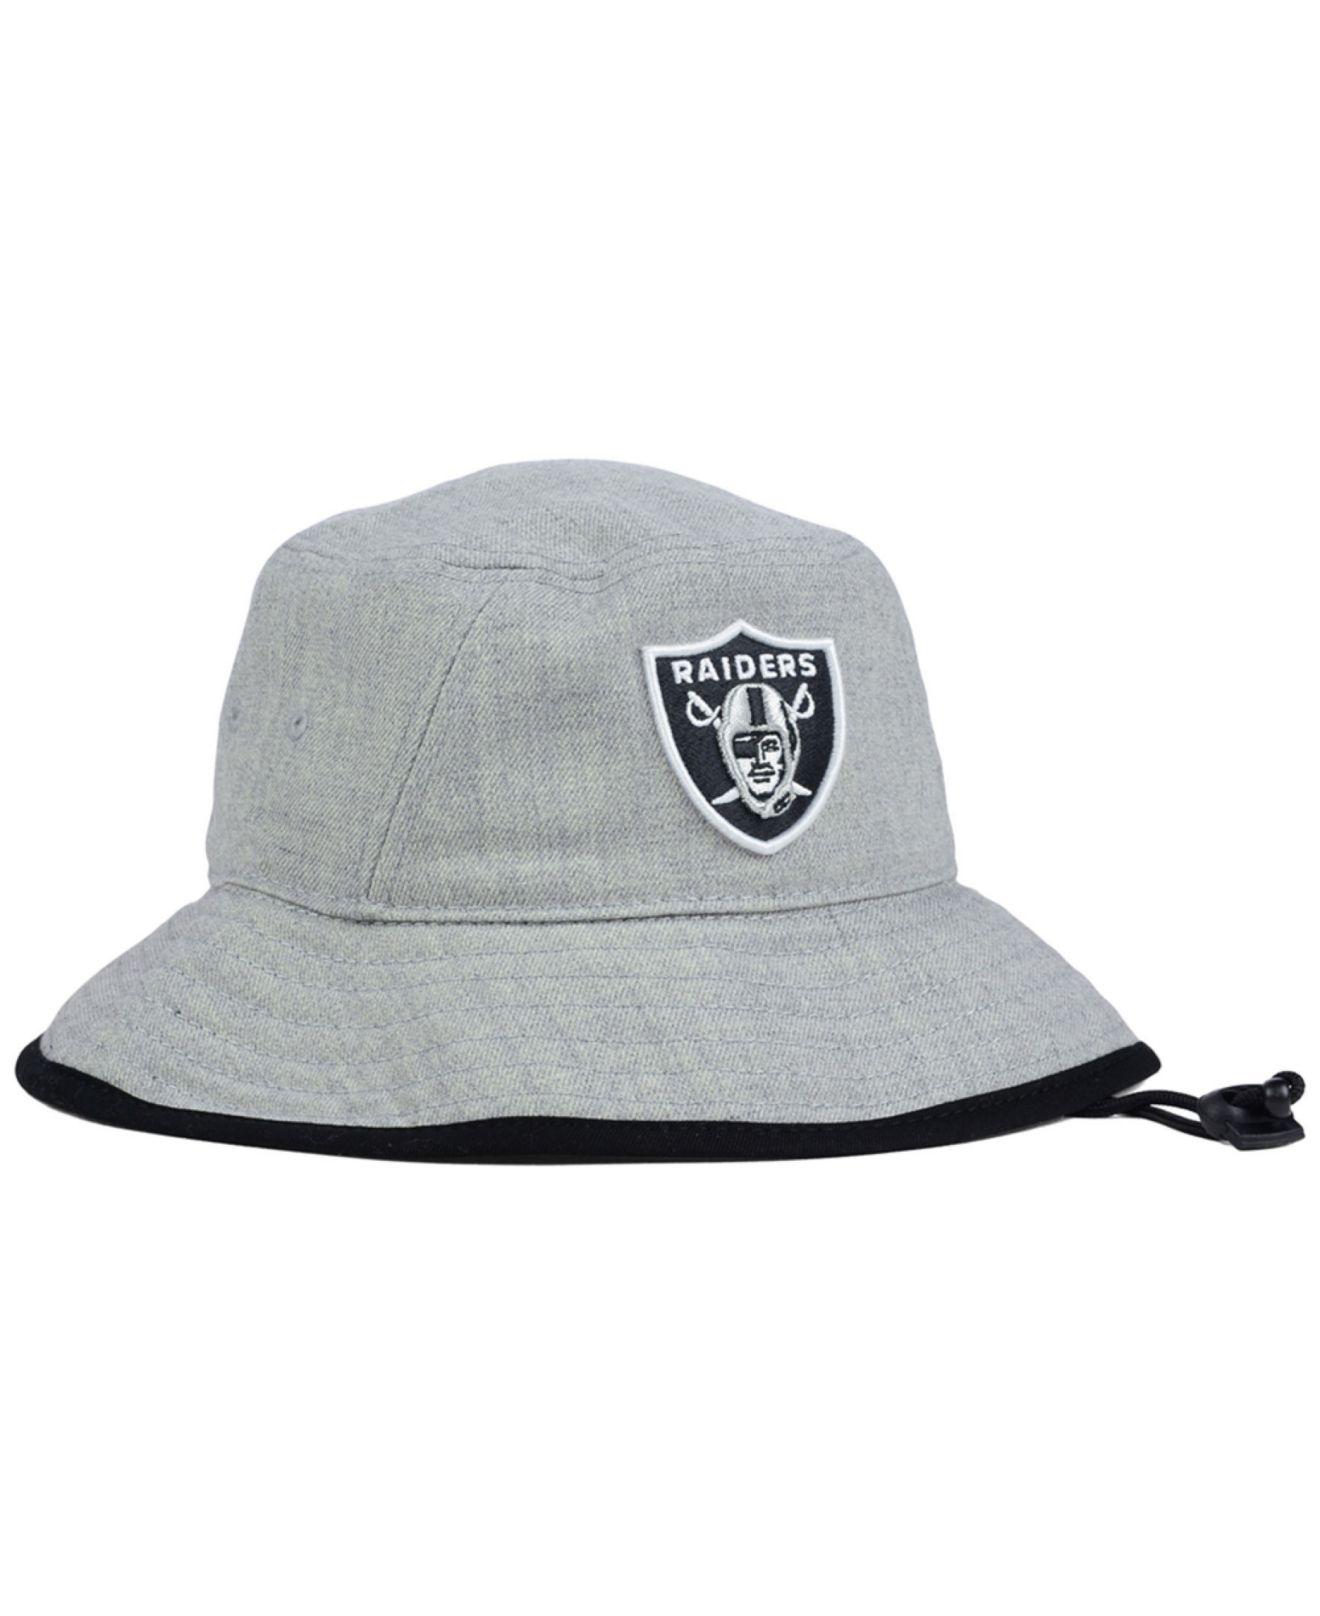 615b887e68b Lyst - KTZ Oakland Raiders Nfl Heather Gray Bucket Hat in Gray